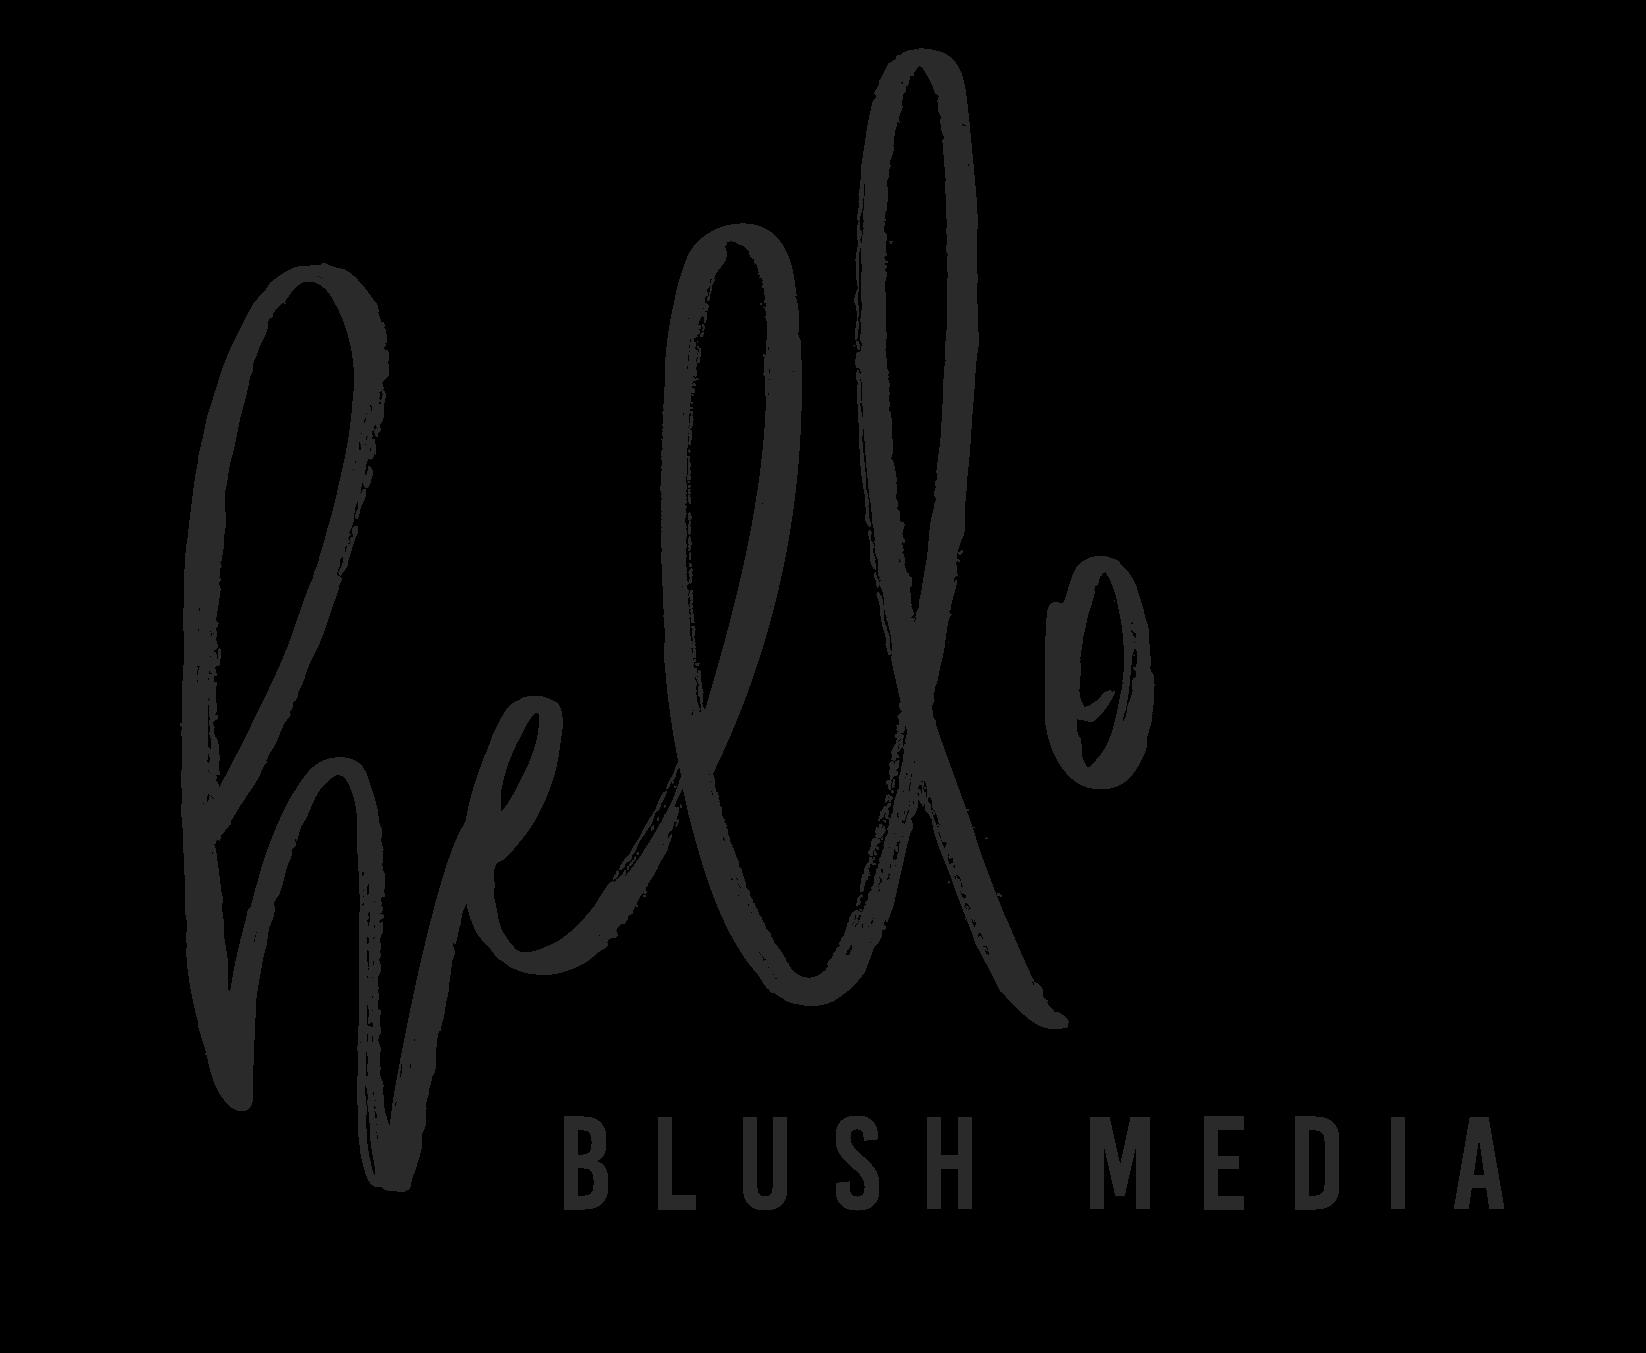 Hello Blush Media